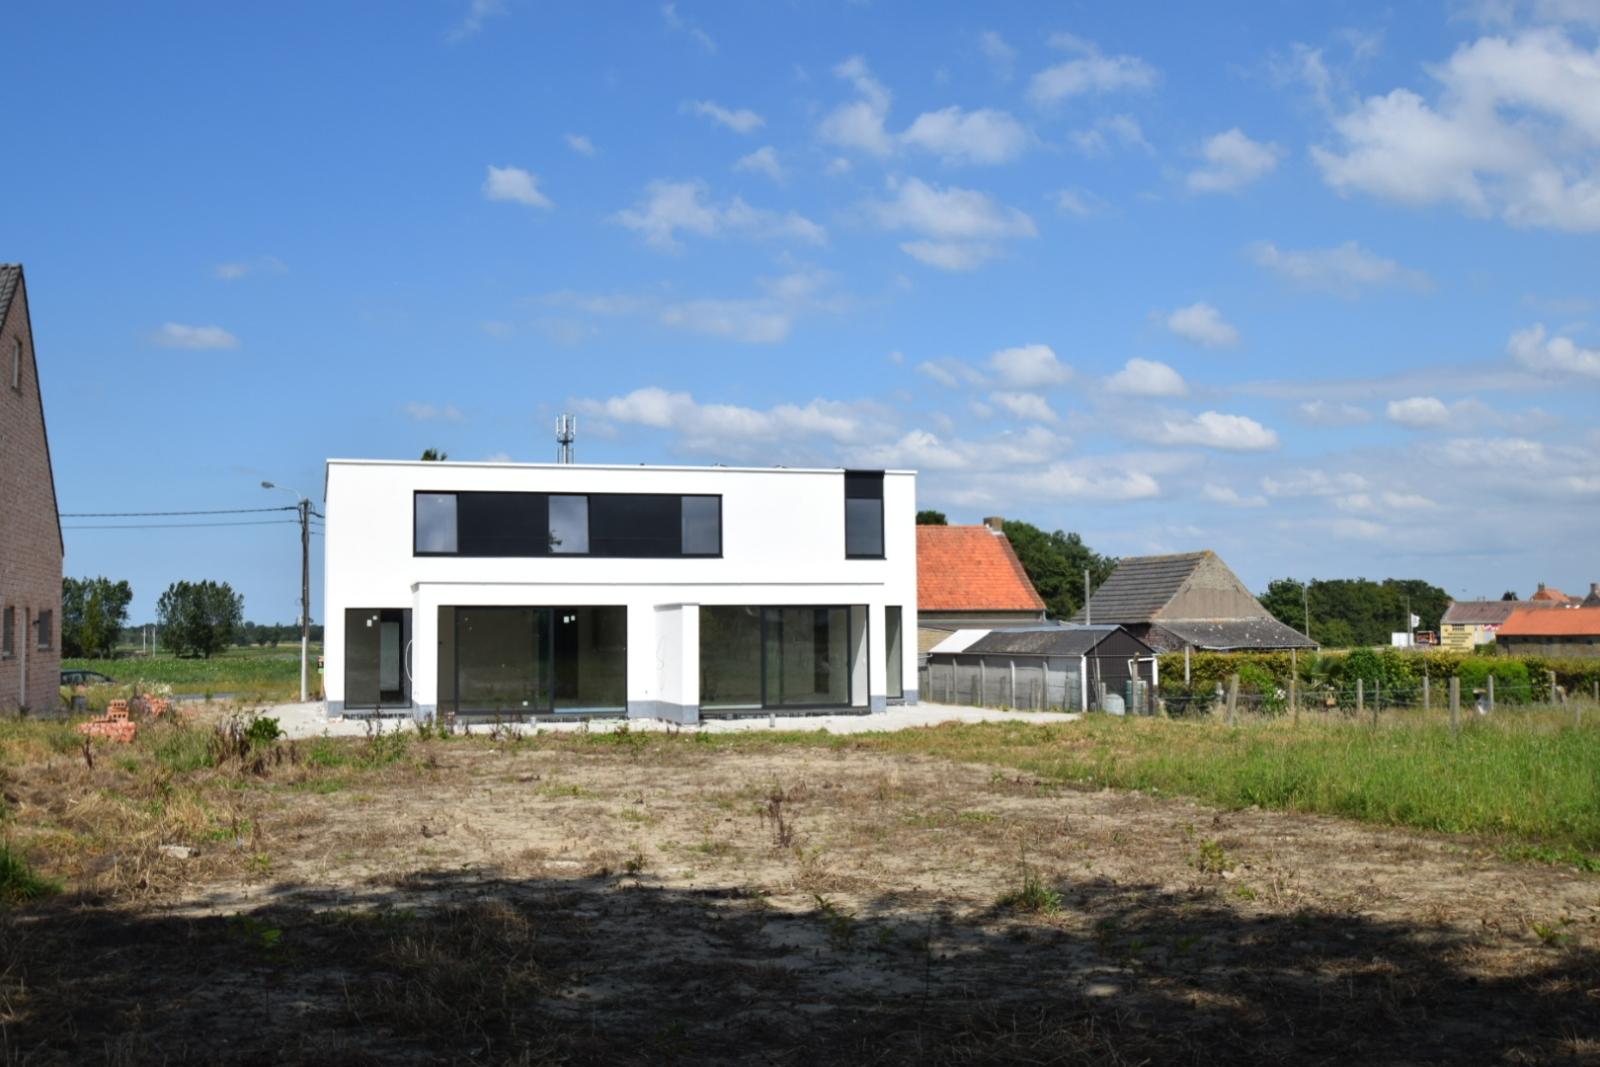 Prachtige moderne nieuwbouwwoning nabij centrum Esen - 3